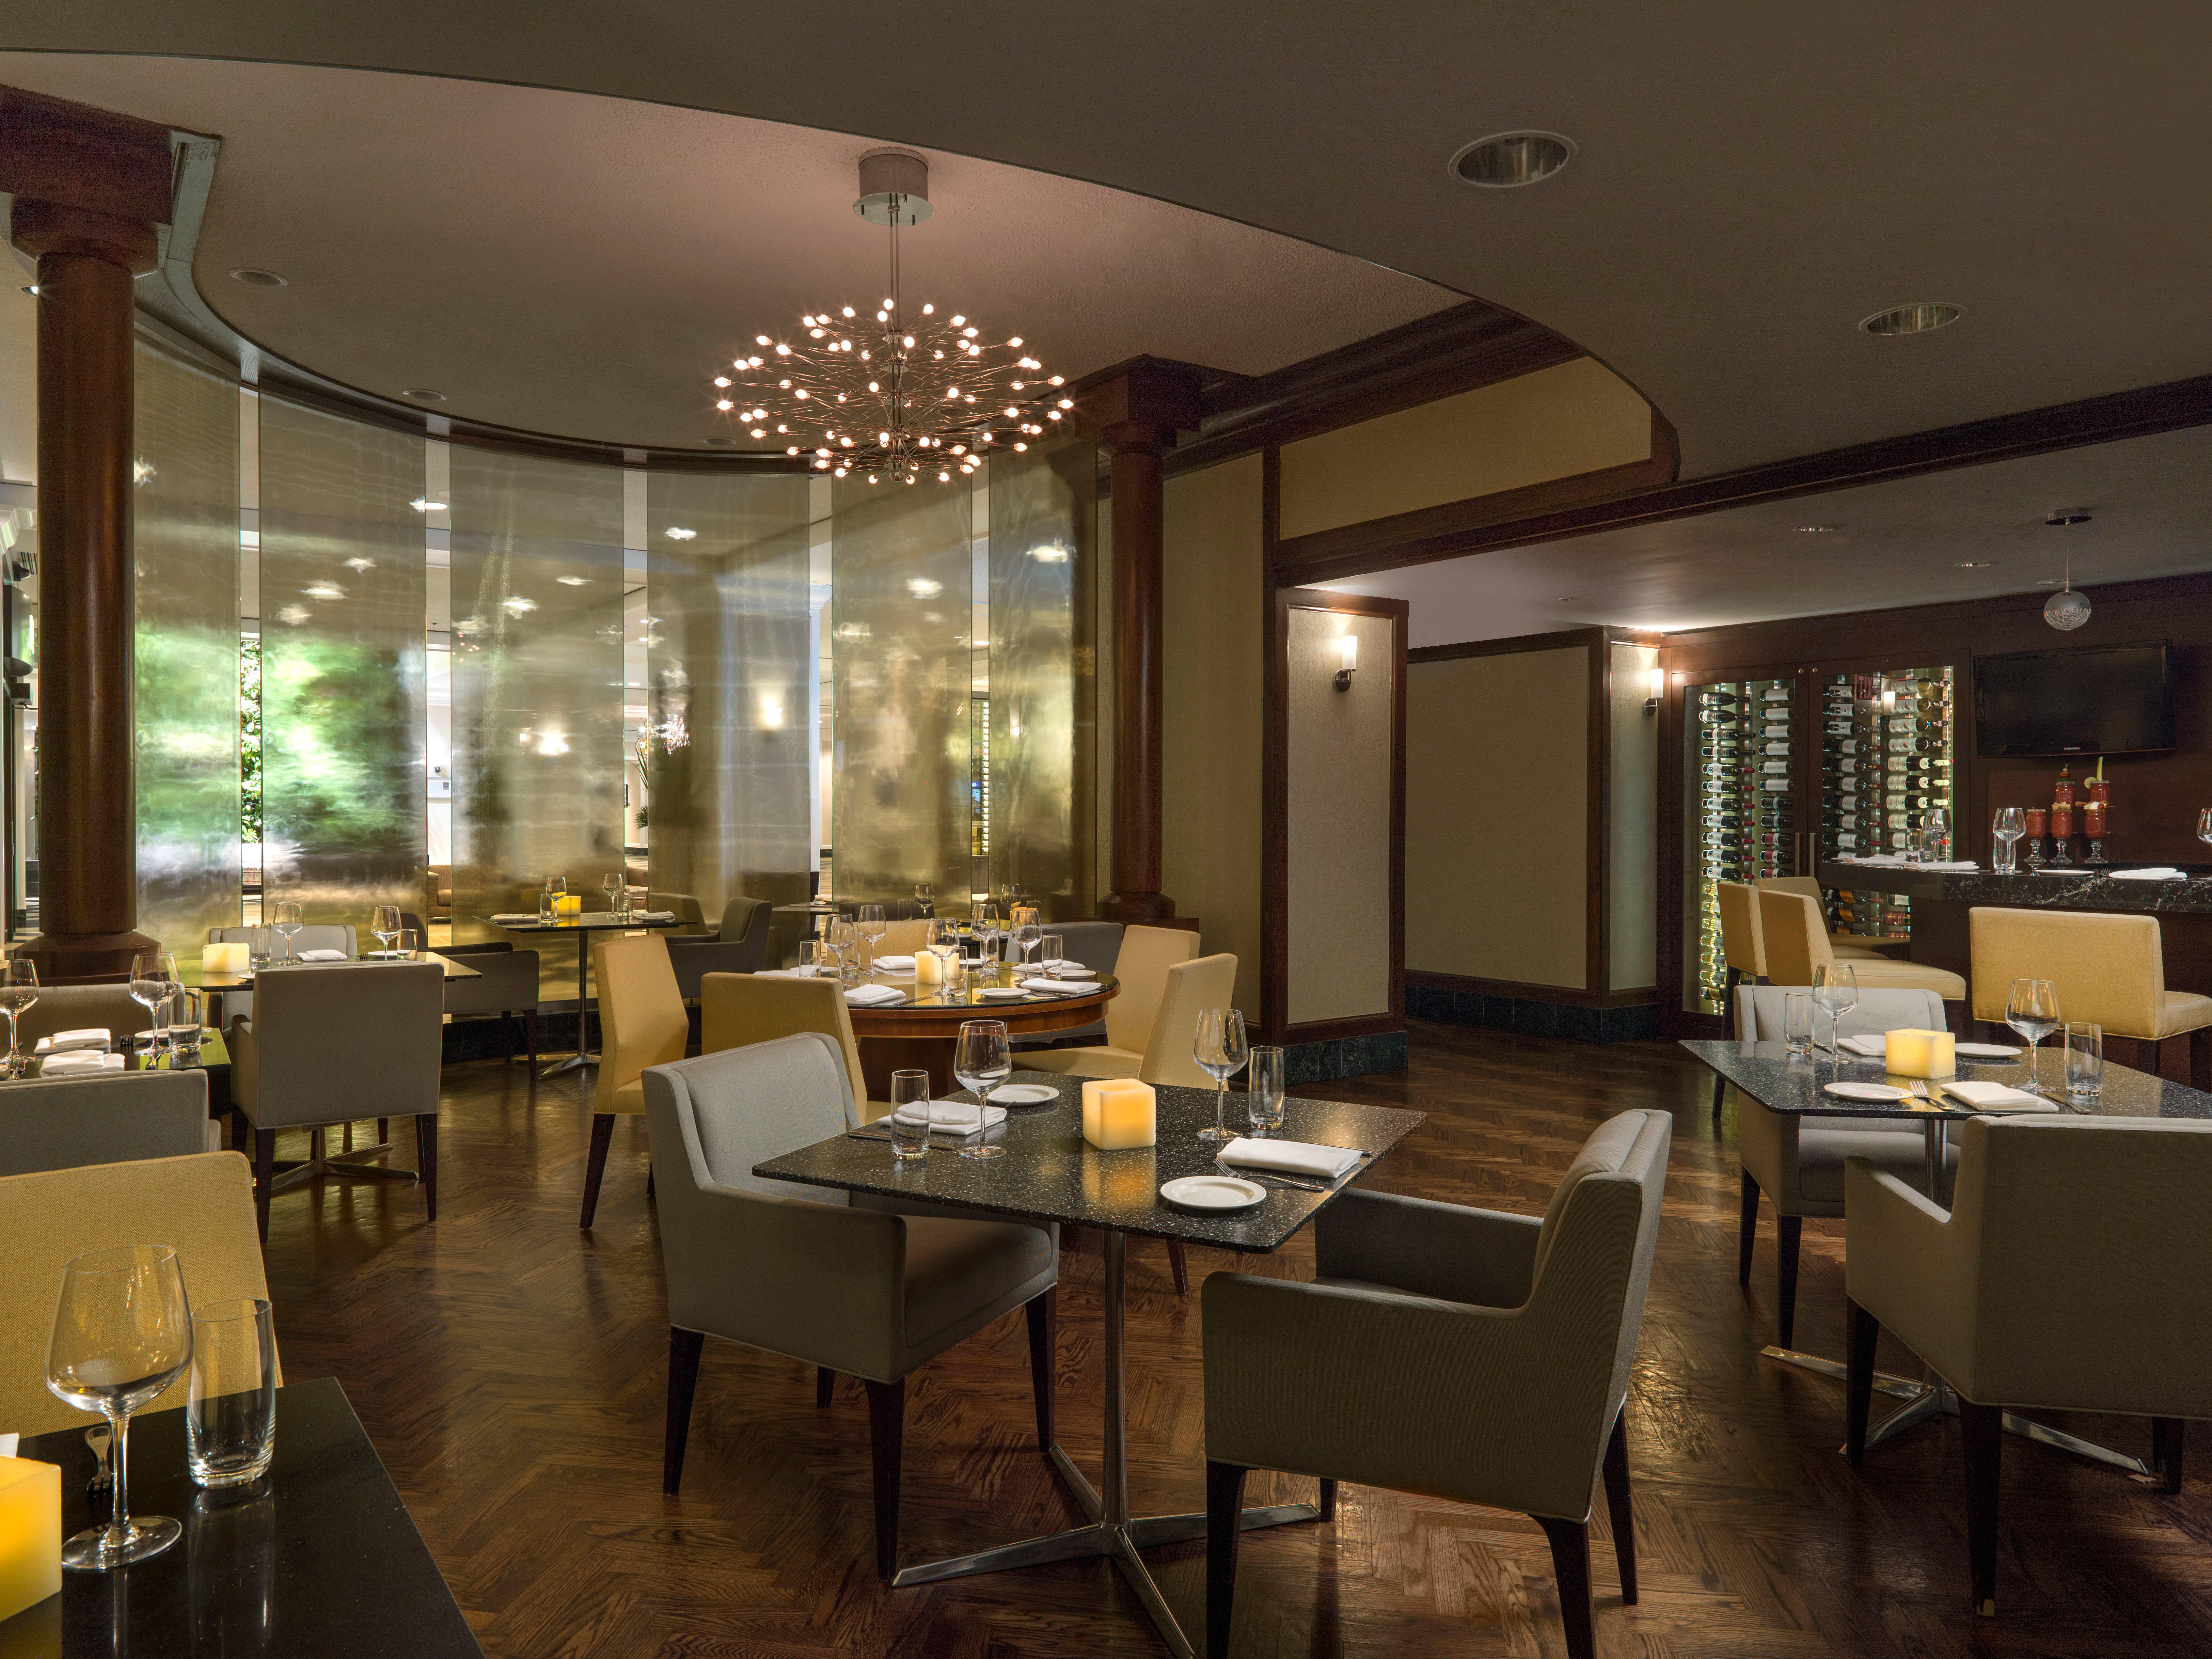 CHELSEA HOTEL, TORONTO in Toronto: T|bar Restaurant